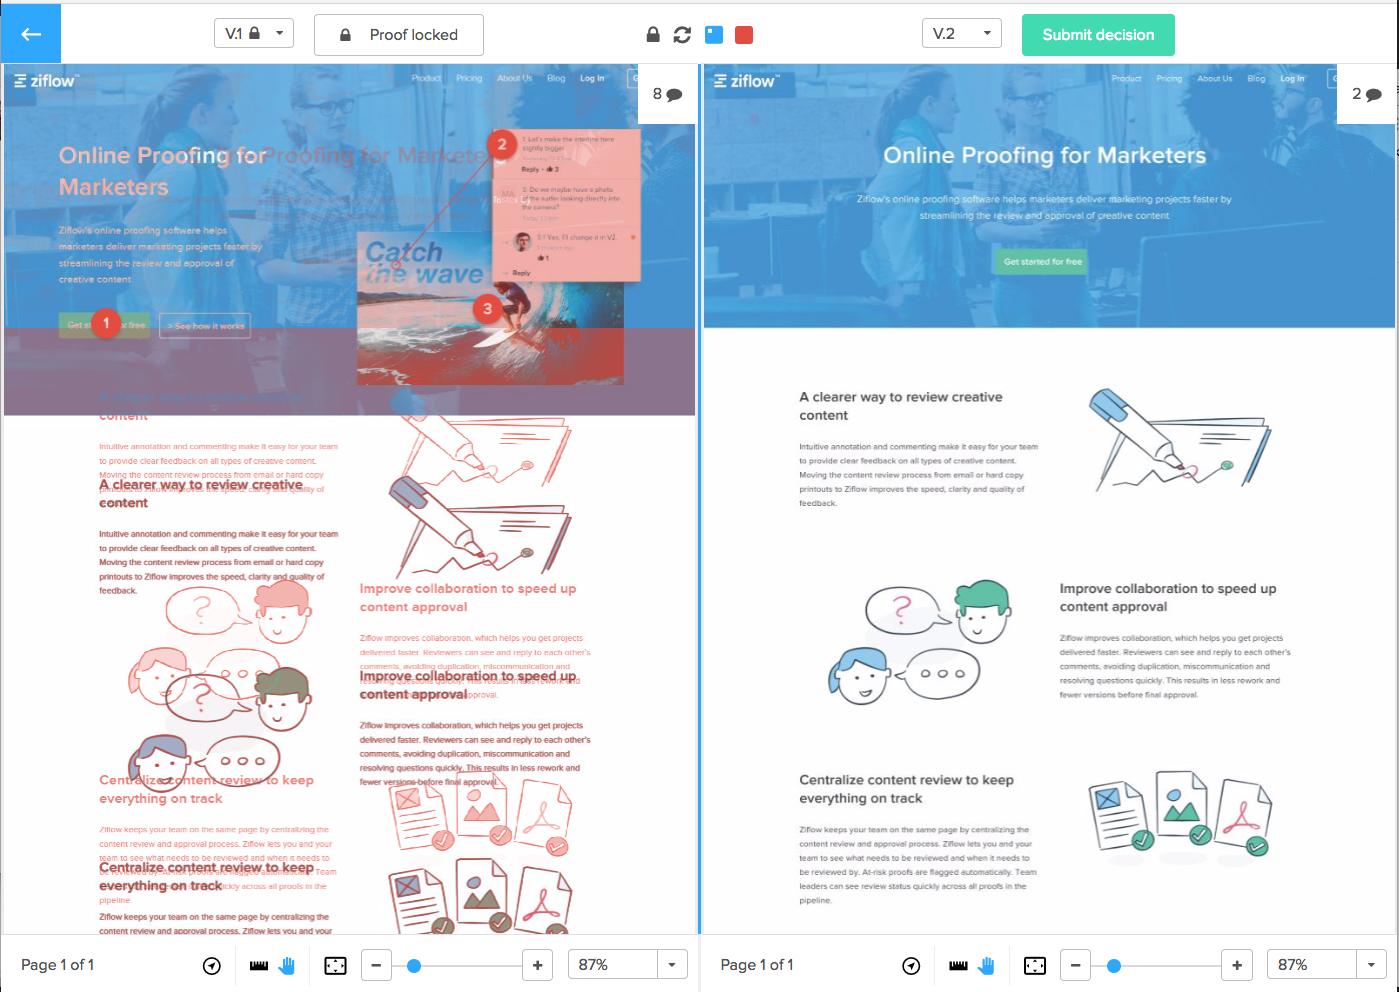 ziflow-online-proofing-compare-mode